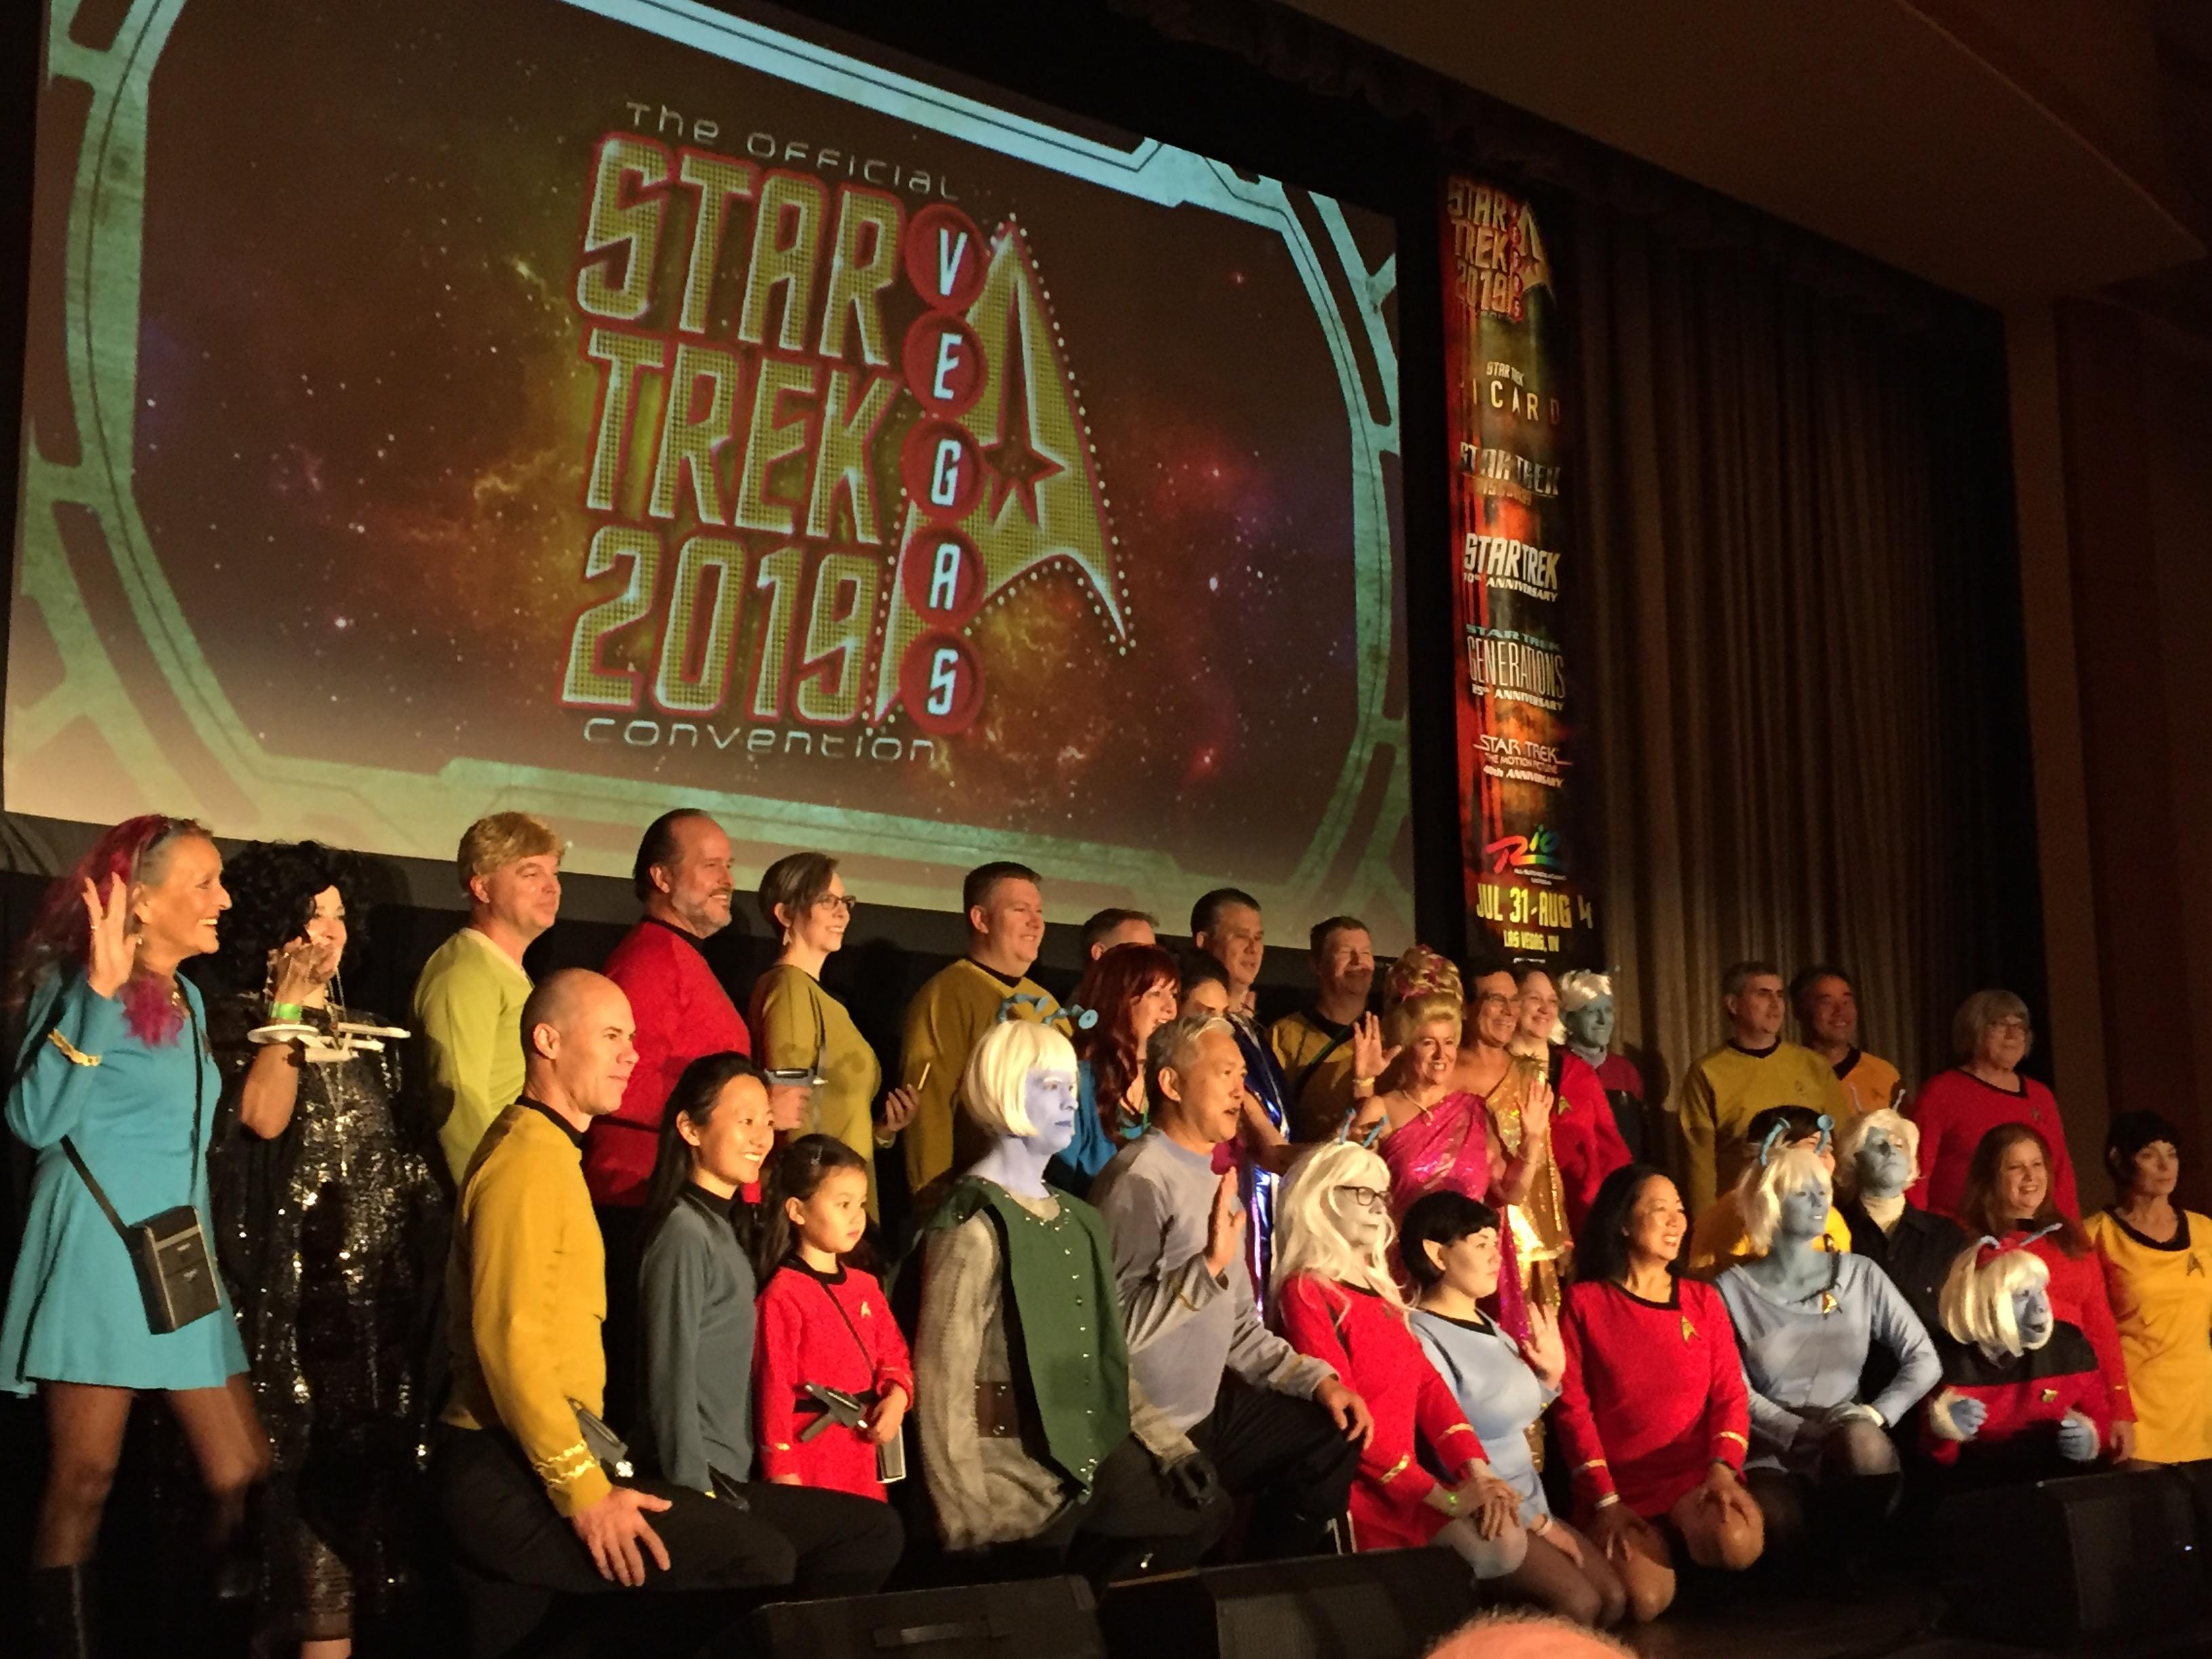 Star Trek Las Vegas, 2019: Reverse angle on the viewer